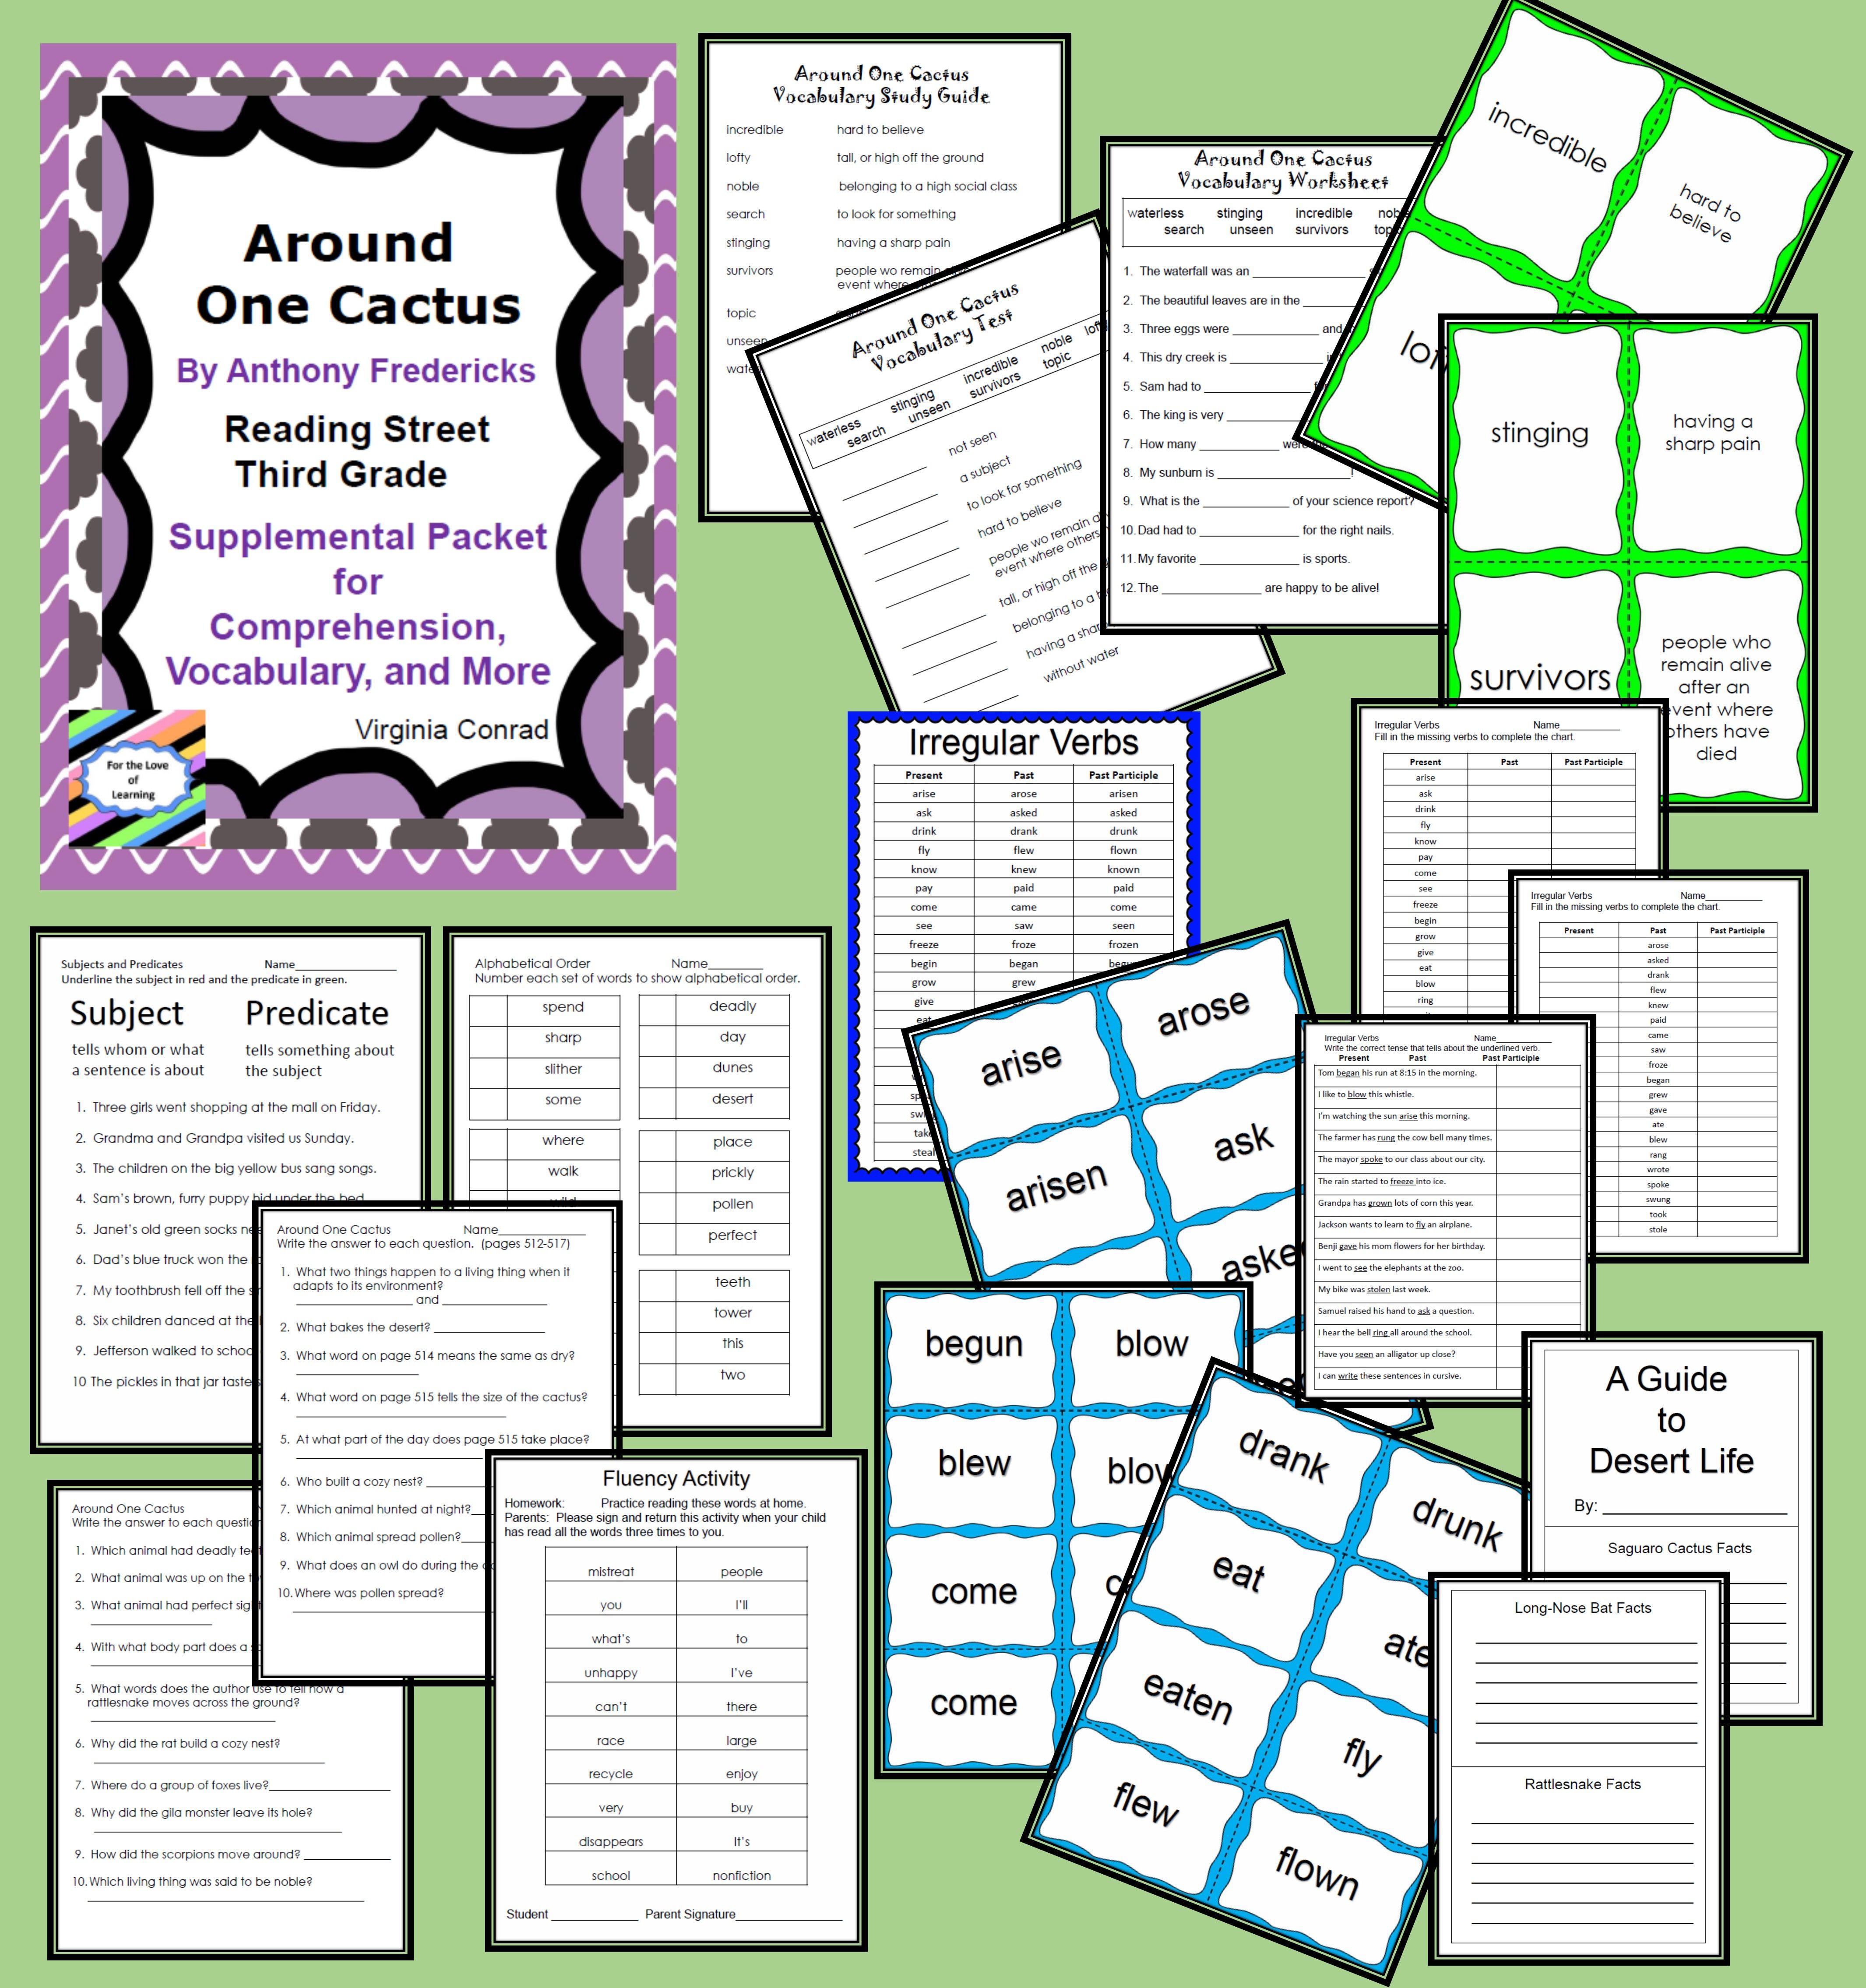 Around One Cactus--Supplemental Packet--Reading Street Third Grade